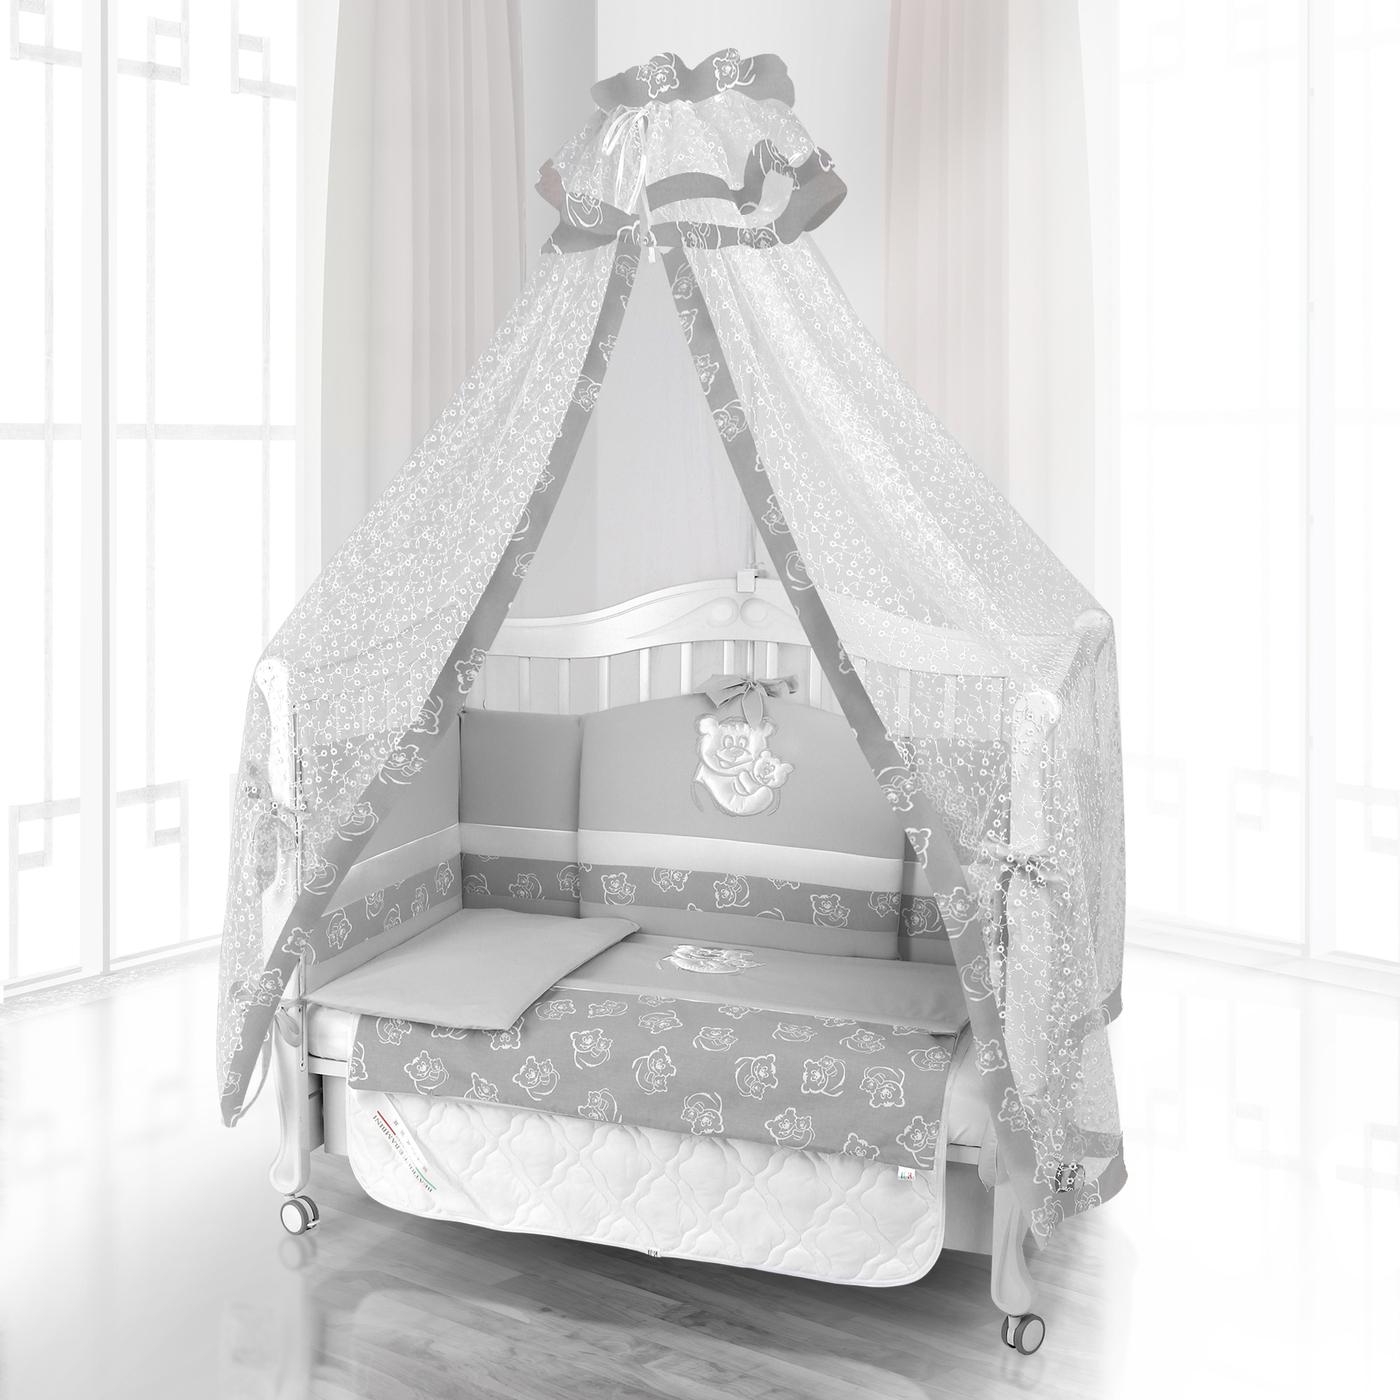 Комплект постельного белья Beatrice Bambini Unico Orso Mamma (125х65) - grigio& grigio